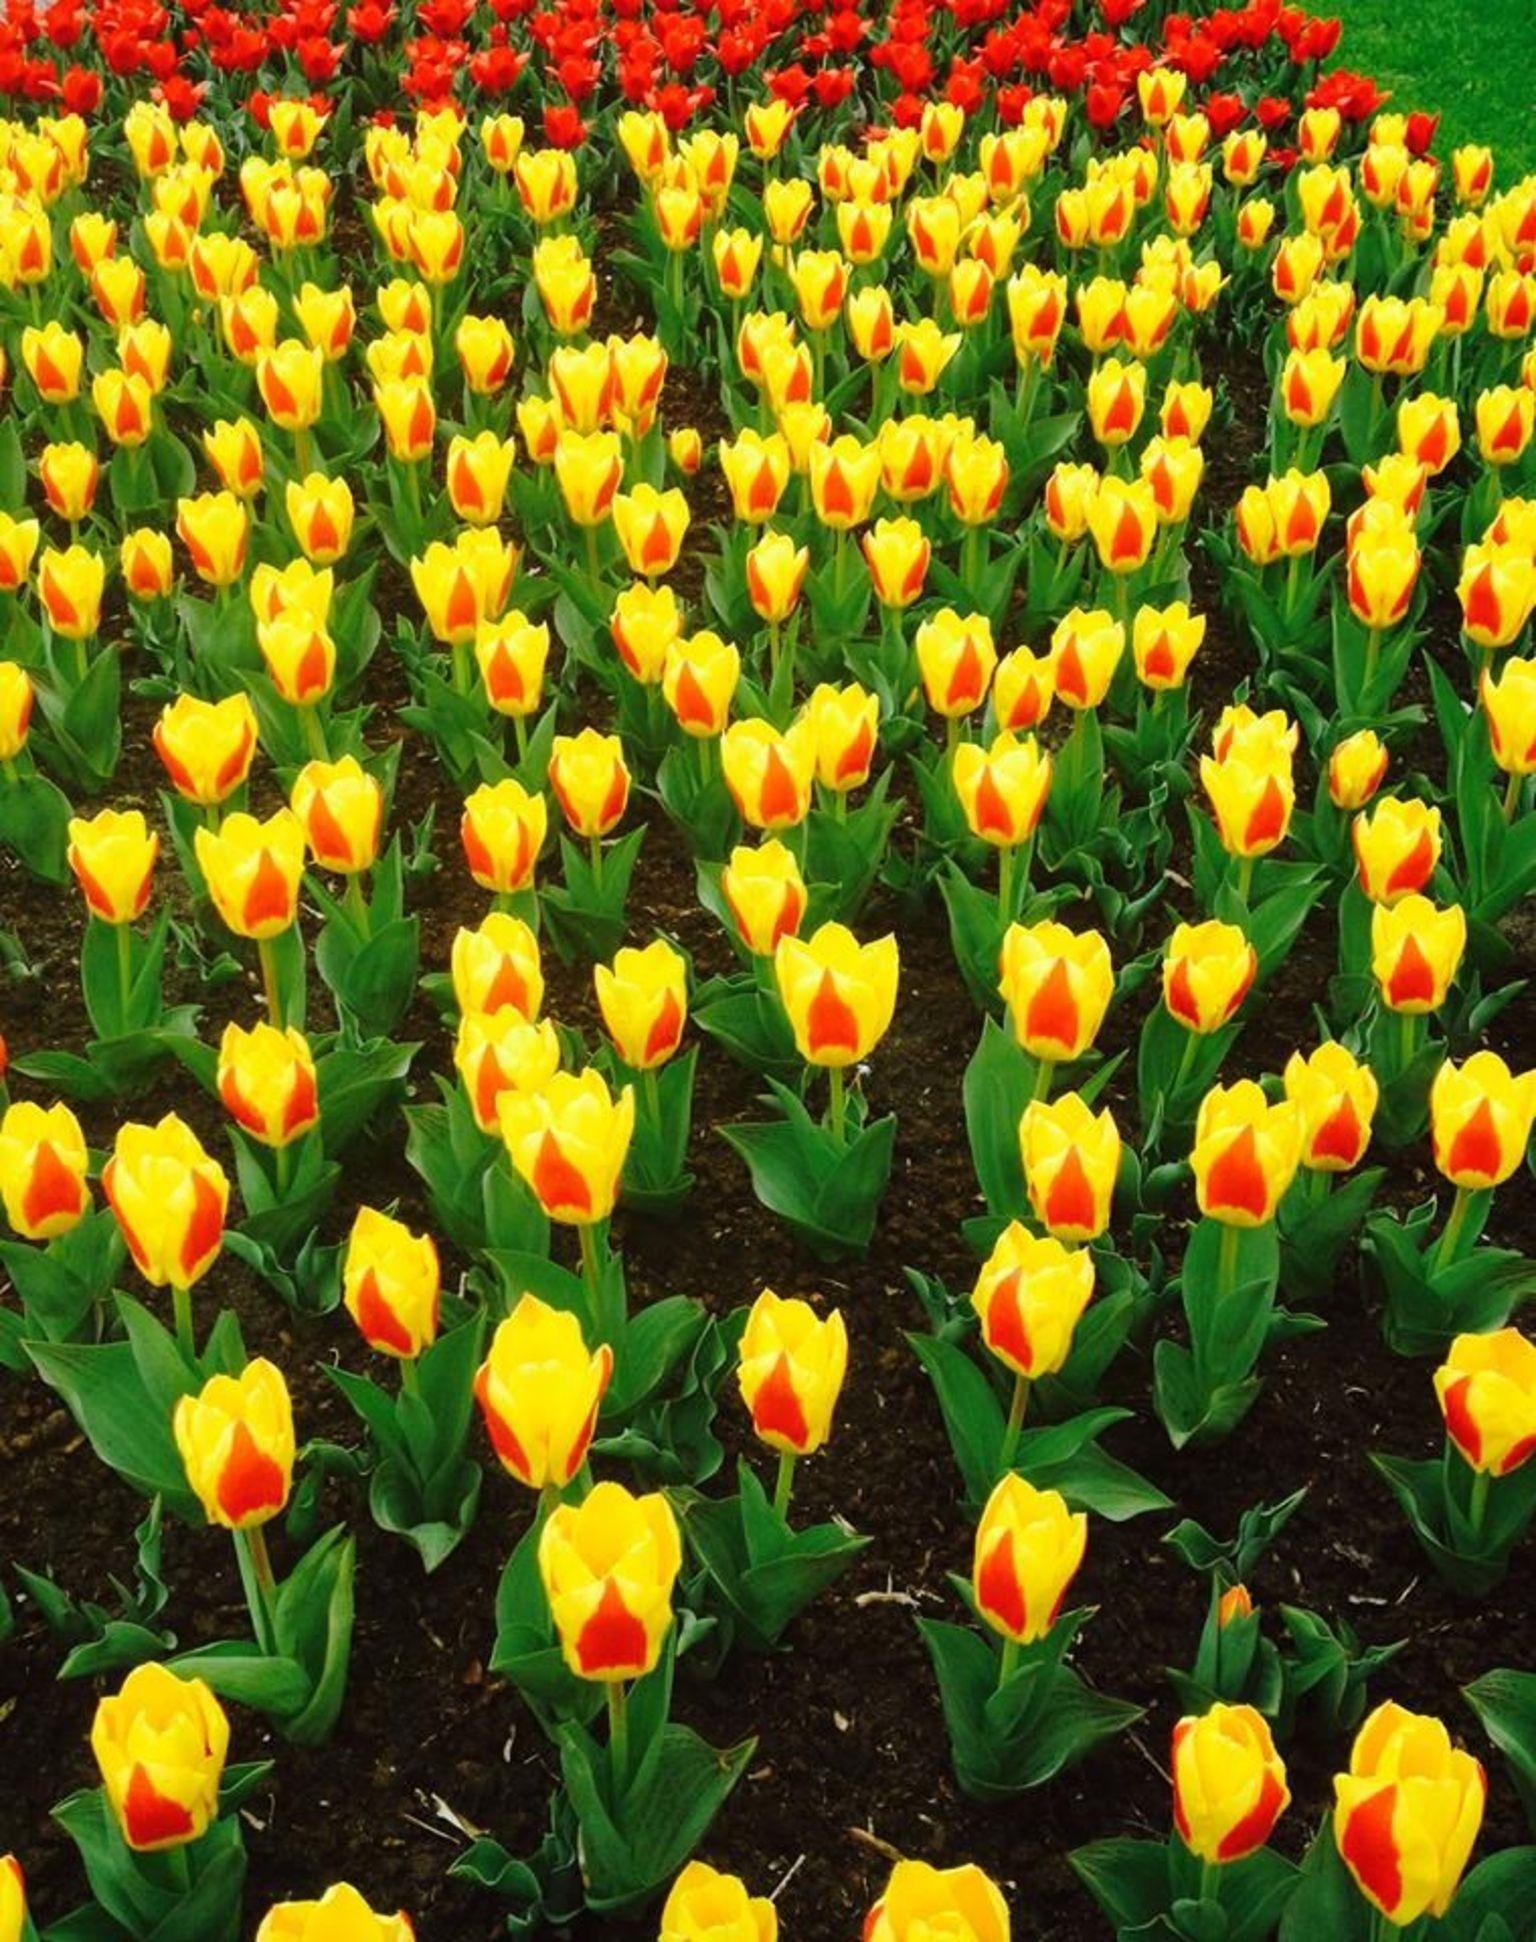 MAIS FOTOS, Guided Half-Day Trip from Amsterdam to the Keukenhof Gardens + Flower Fields